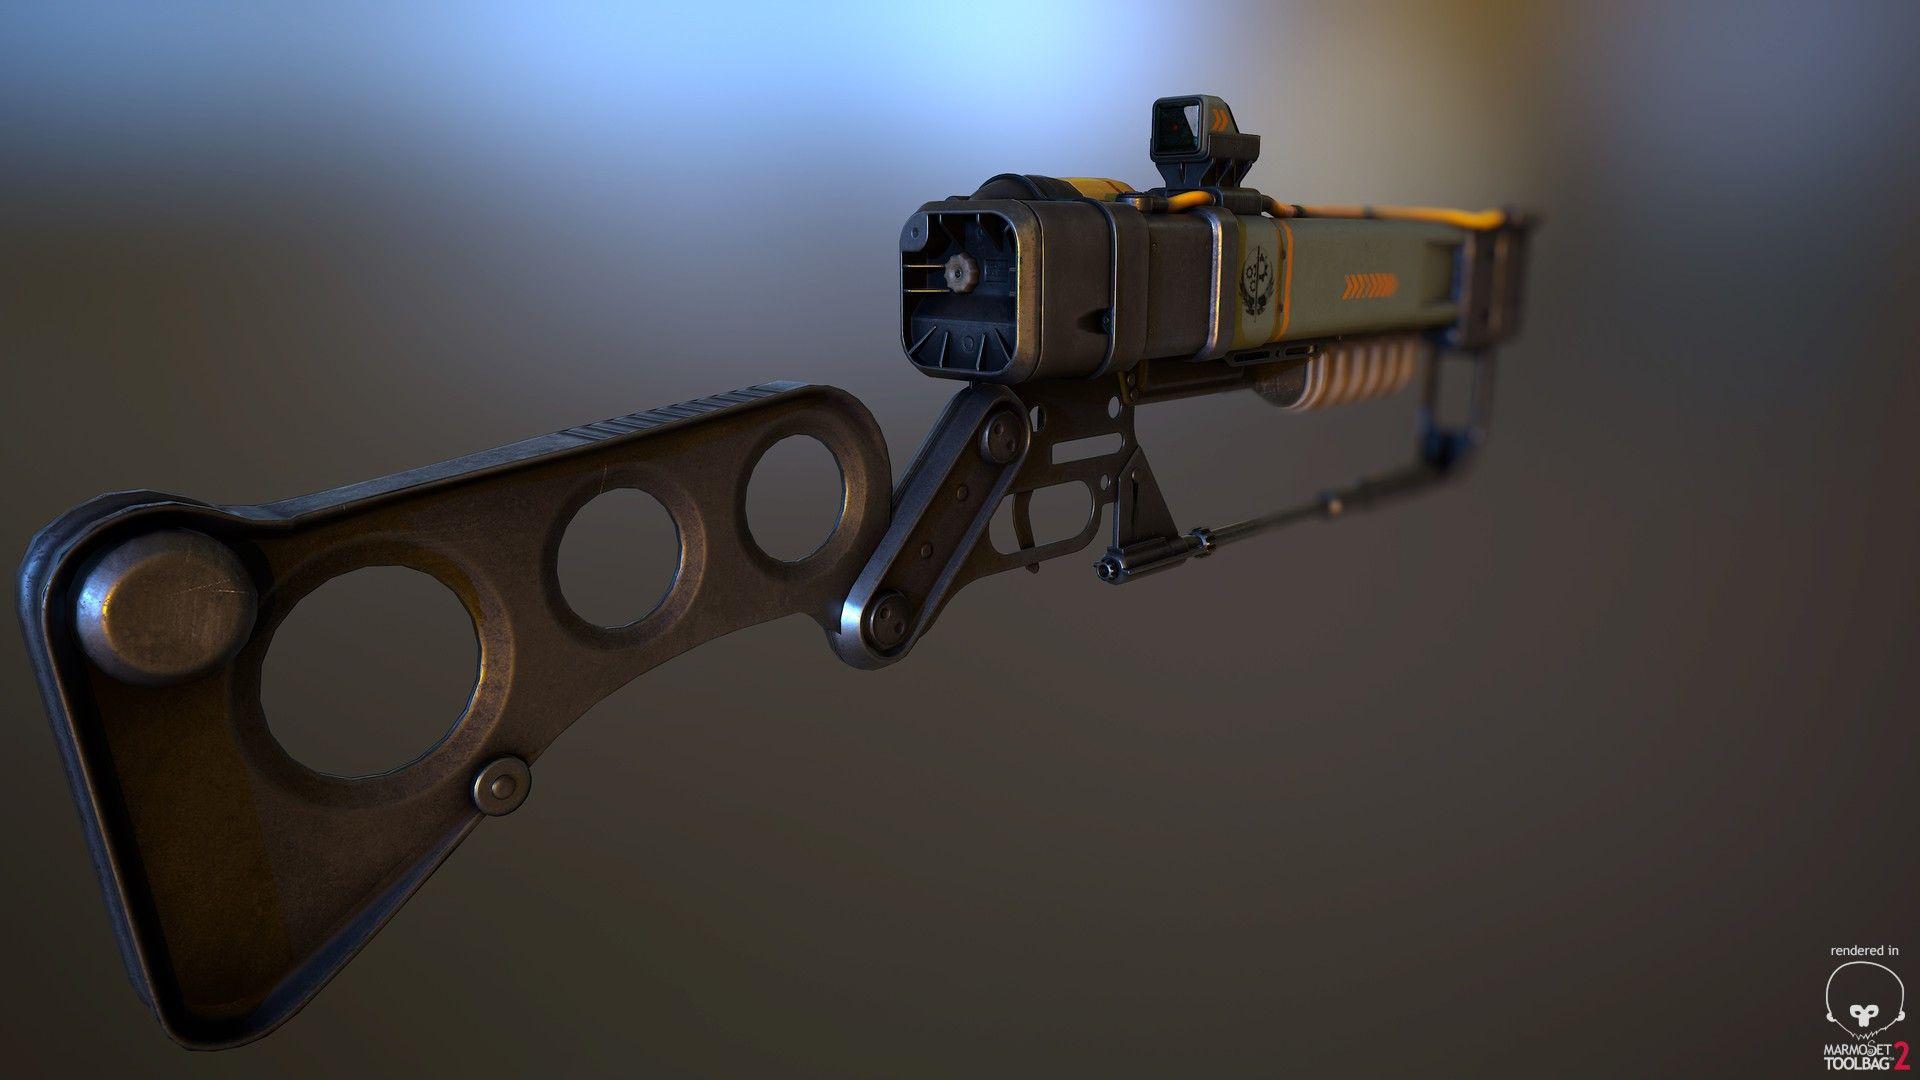 ArtStation - The Laser Rifle - Fallout 4 fanart, Erik Bäckström